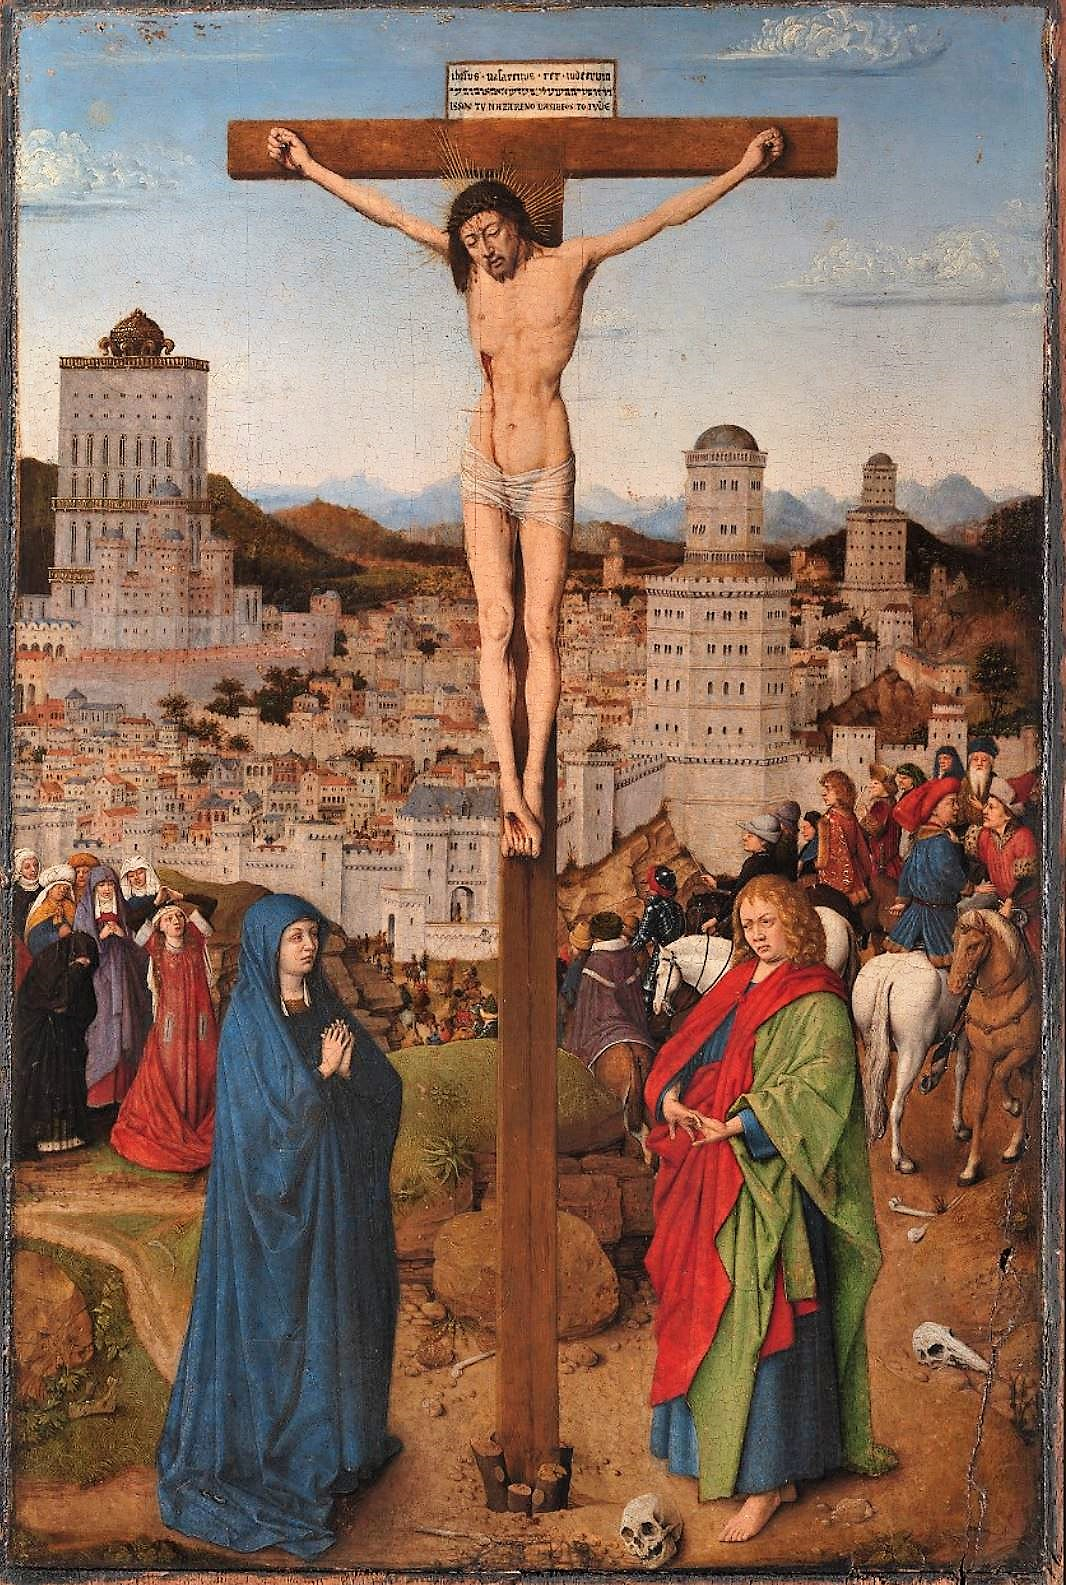 Van-Eyck-atelier-1440-50-Crucifixion-Ca-doro-Venise